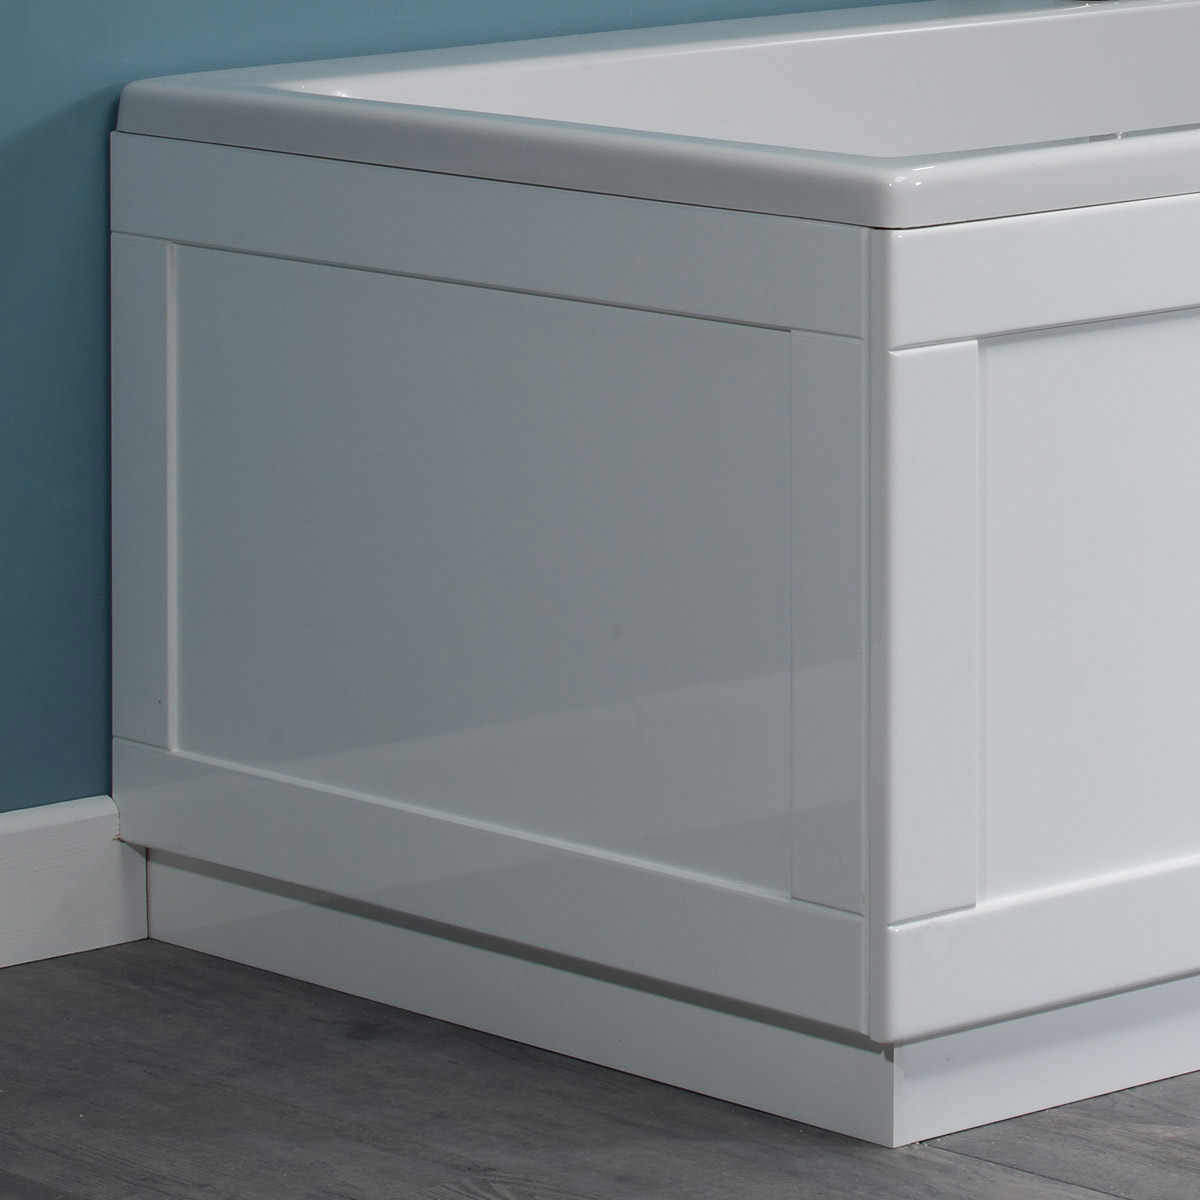 Roper Rhodes 800 Series 700mm White Bath End Furniture Panel